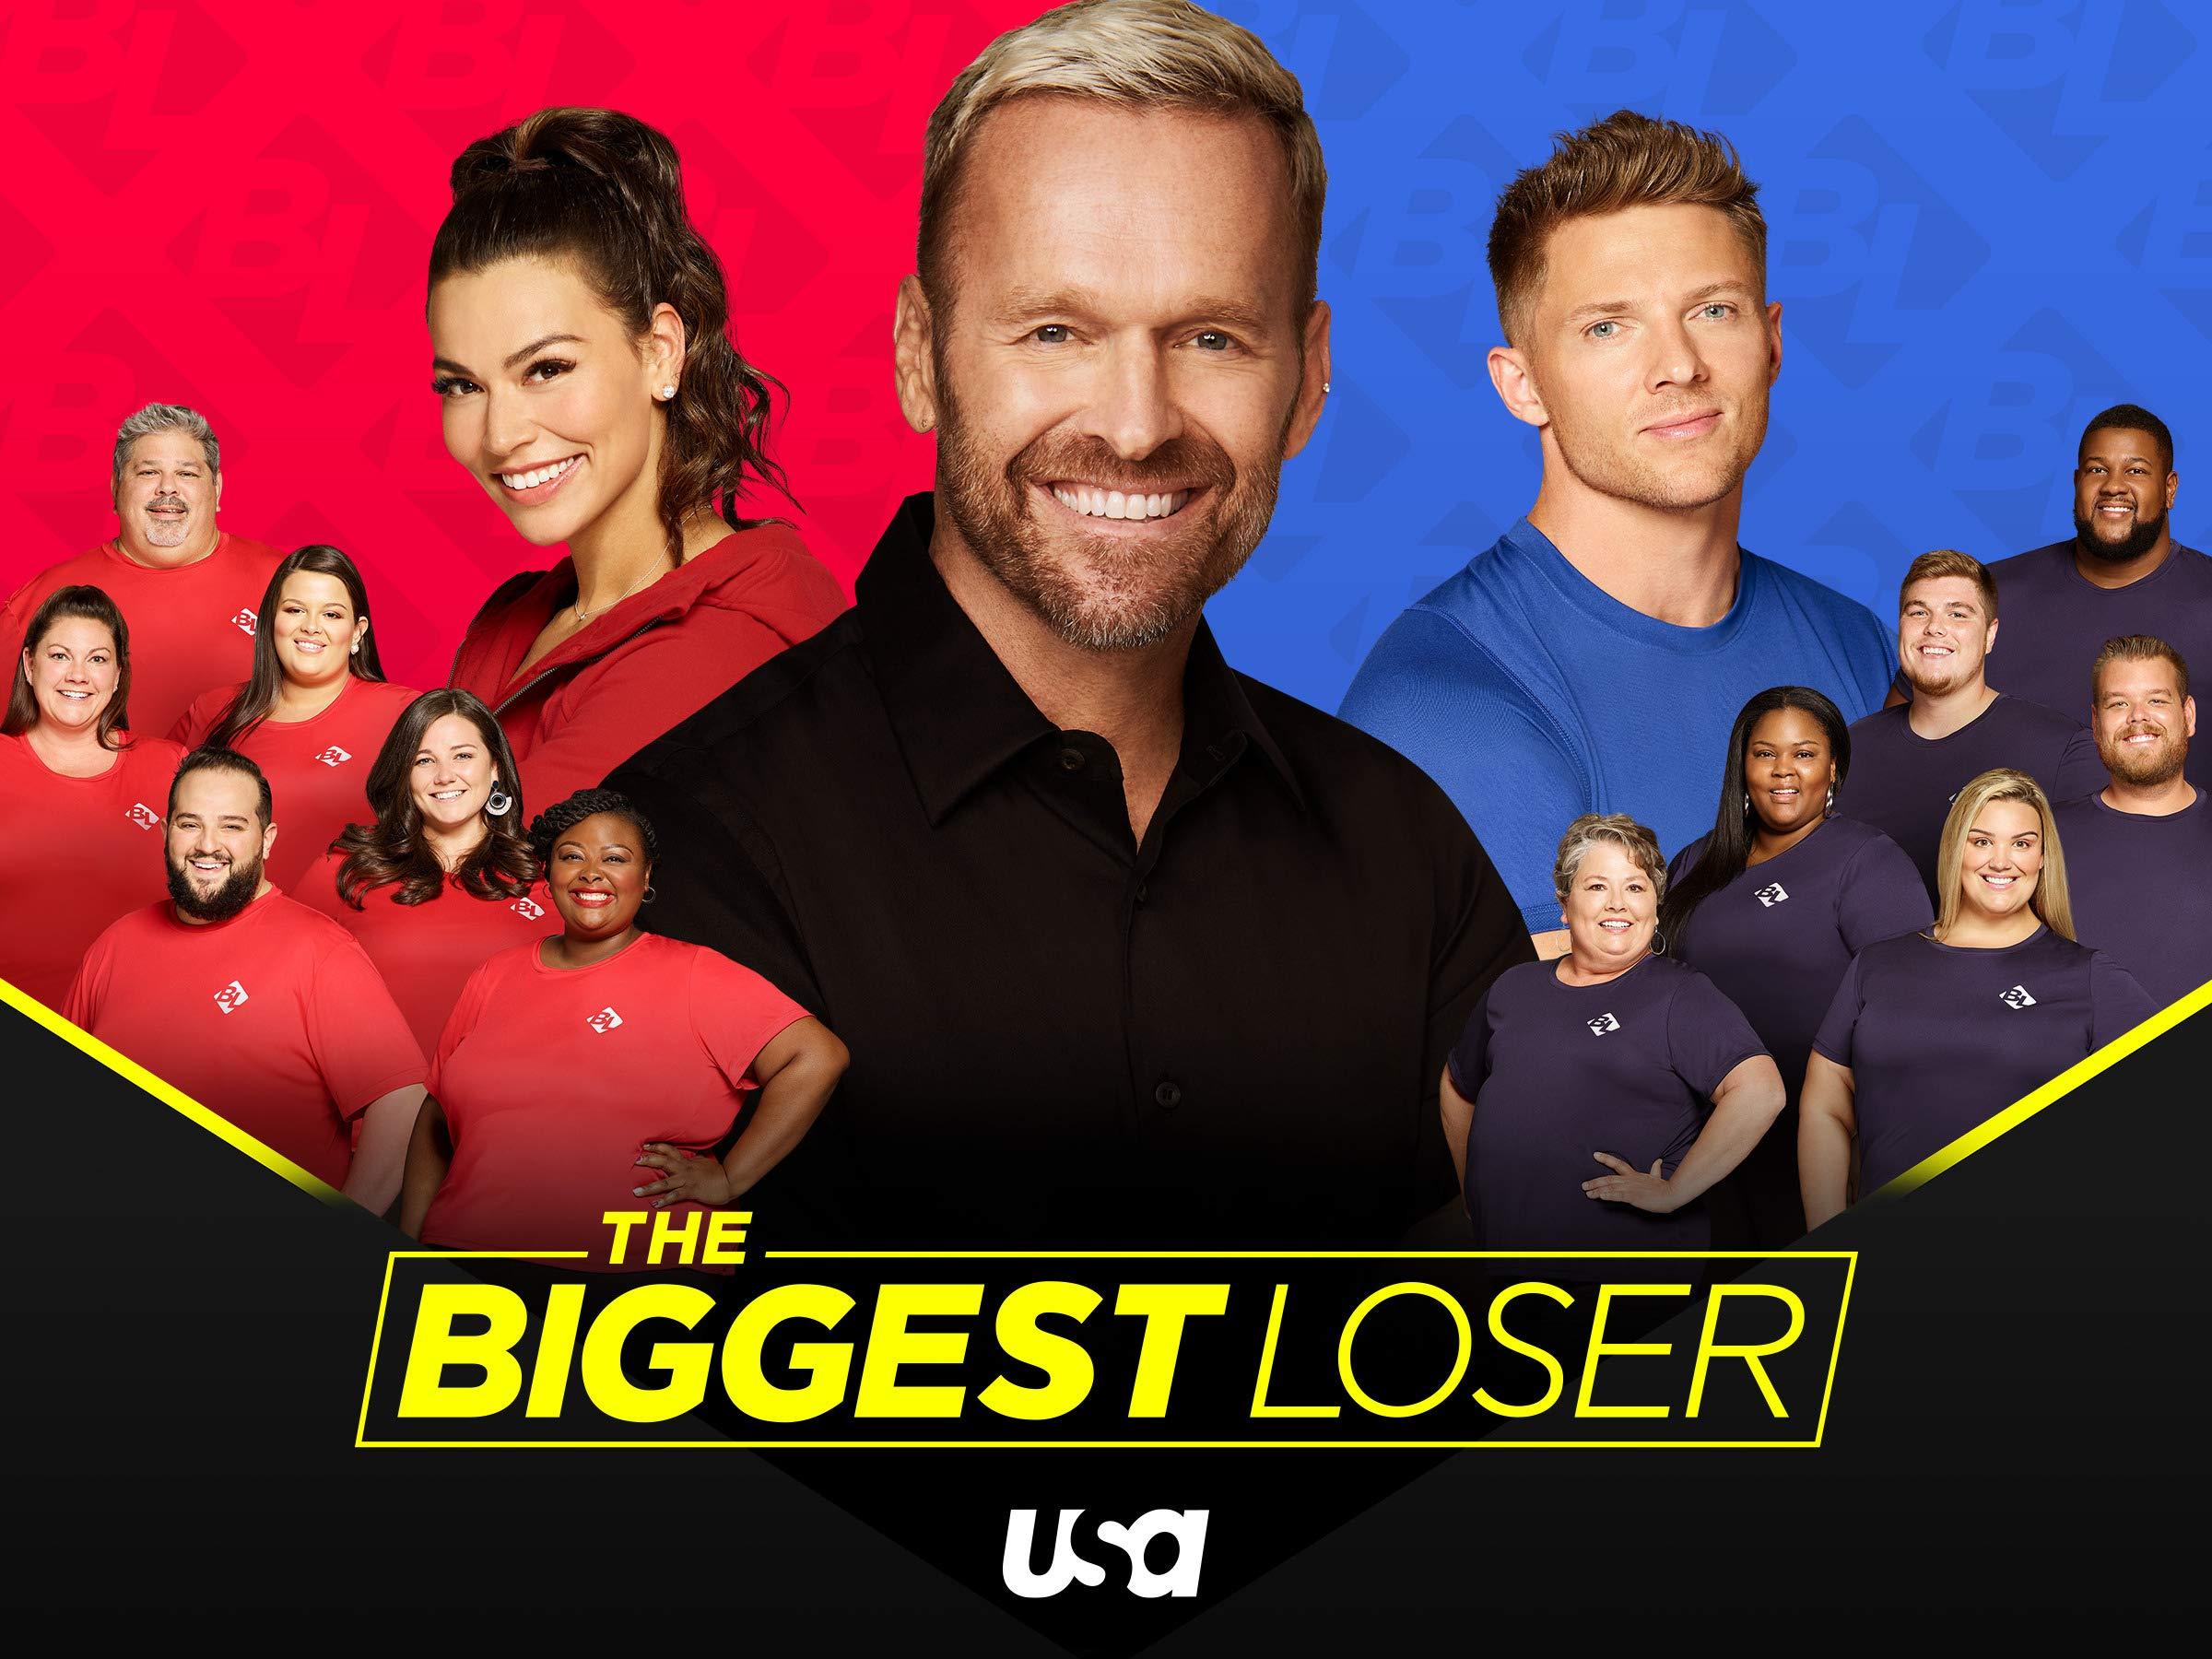 Biggest Loser 2020 - Biggest Loser Season 18 2020 Host